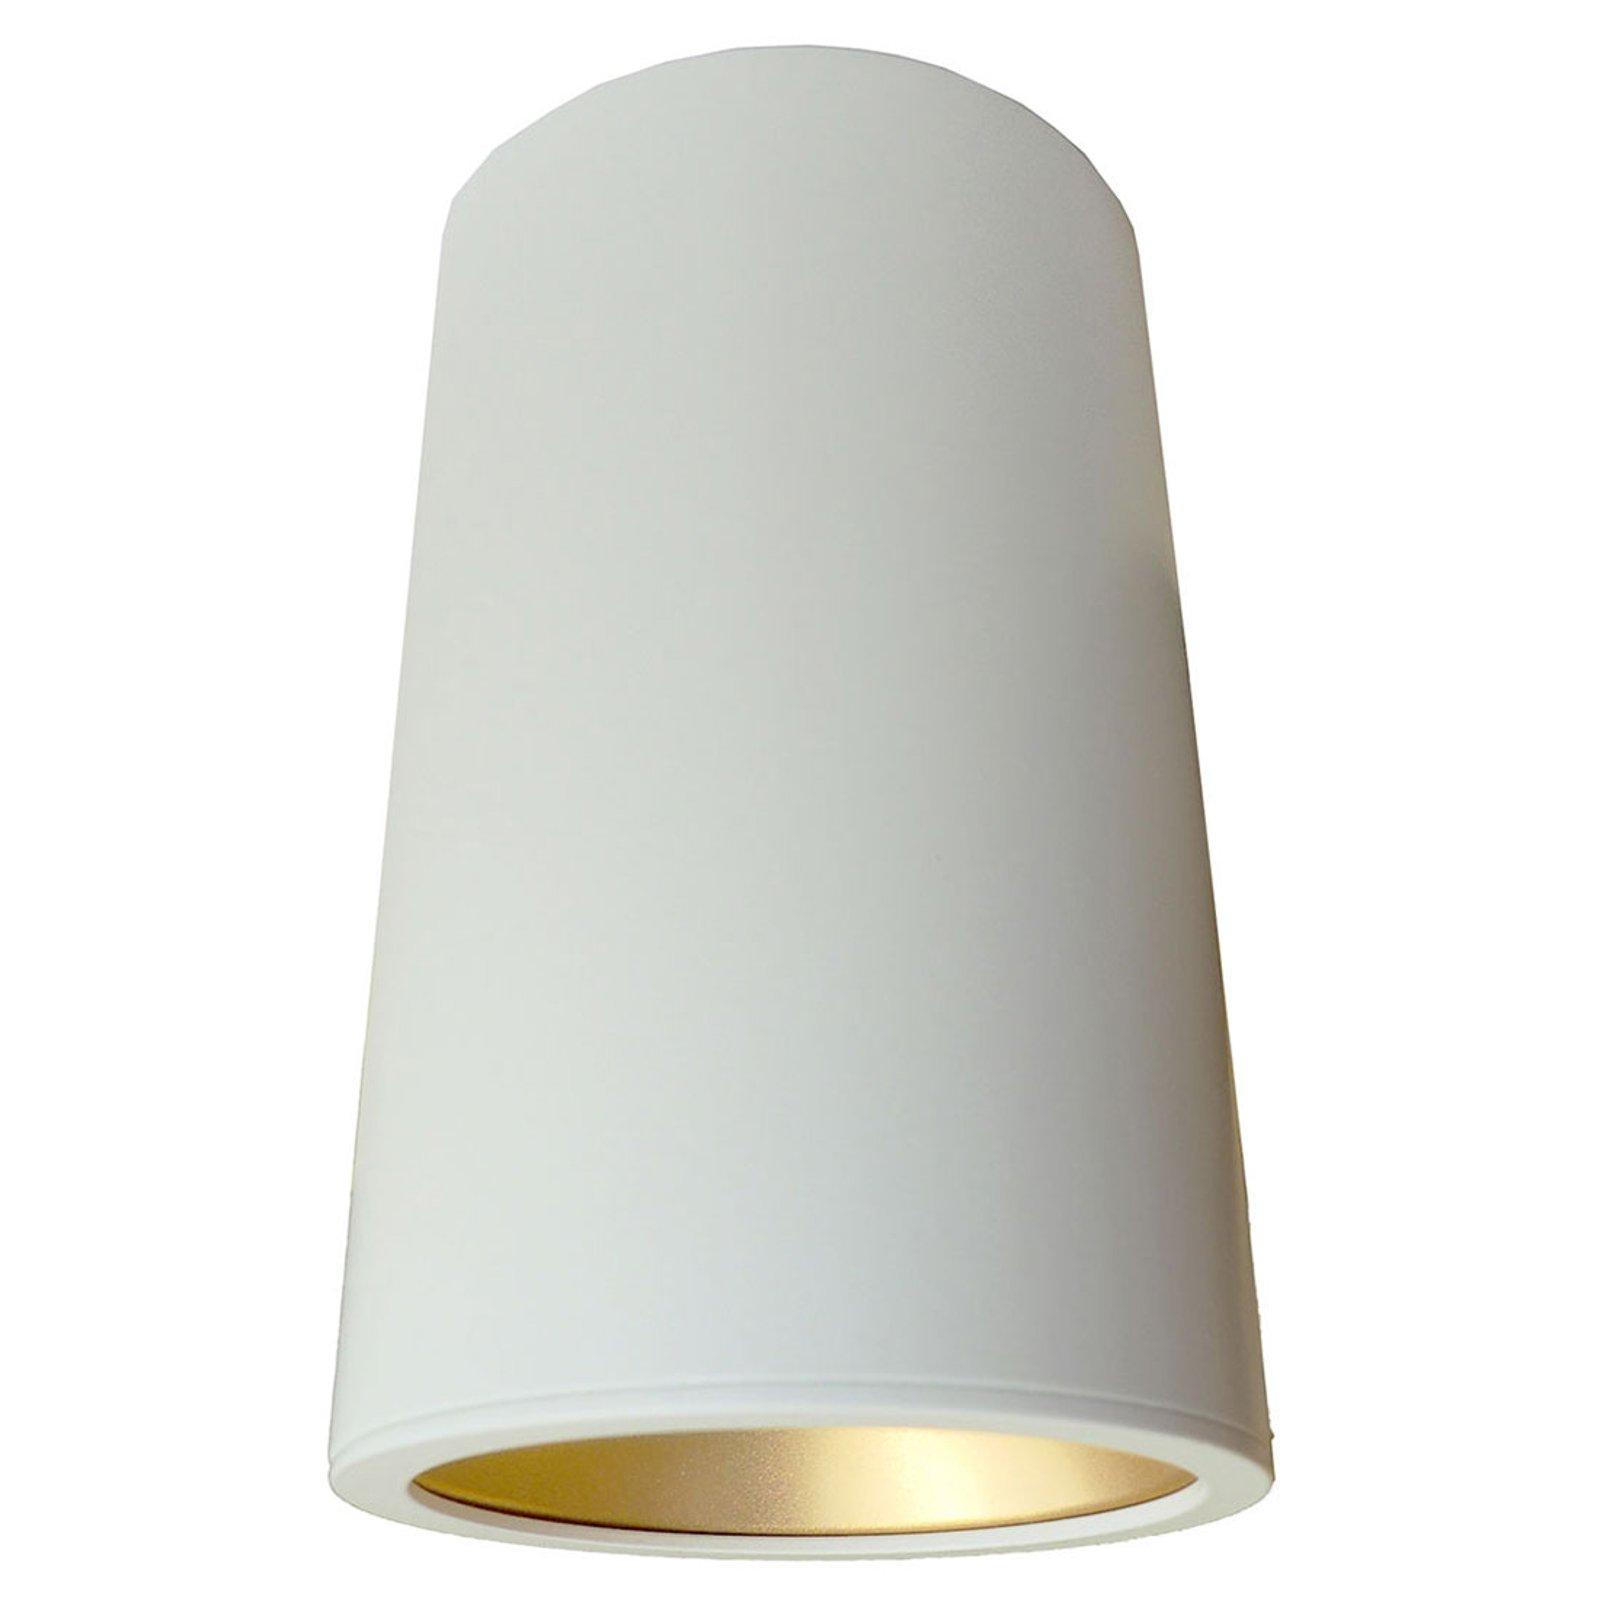 LED-downlight Jesta, hvit